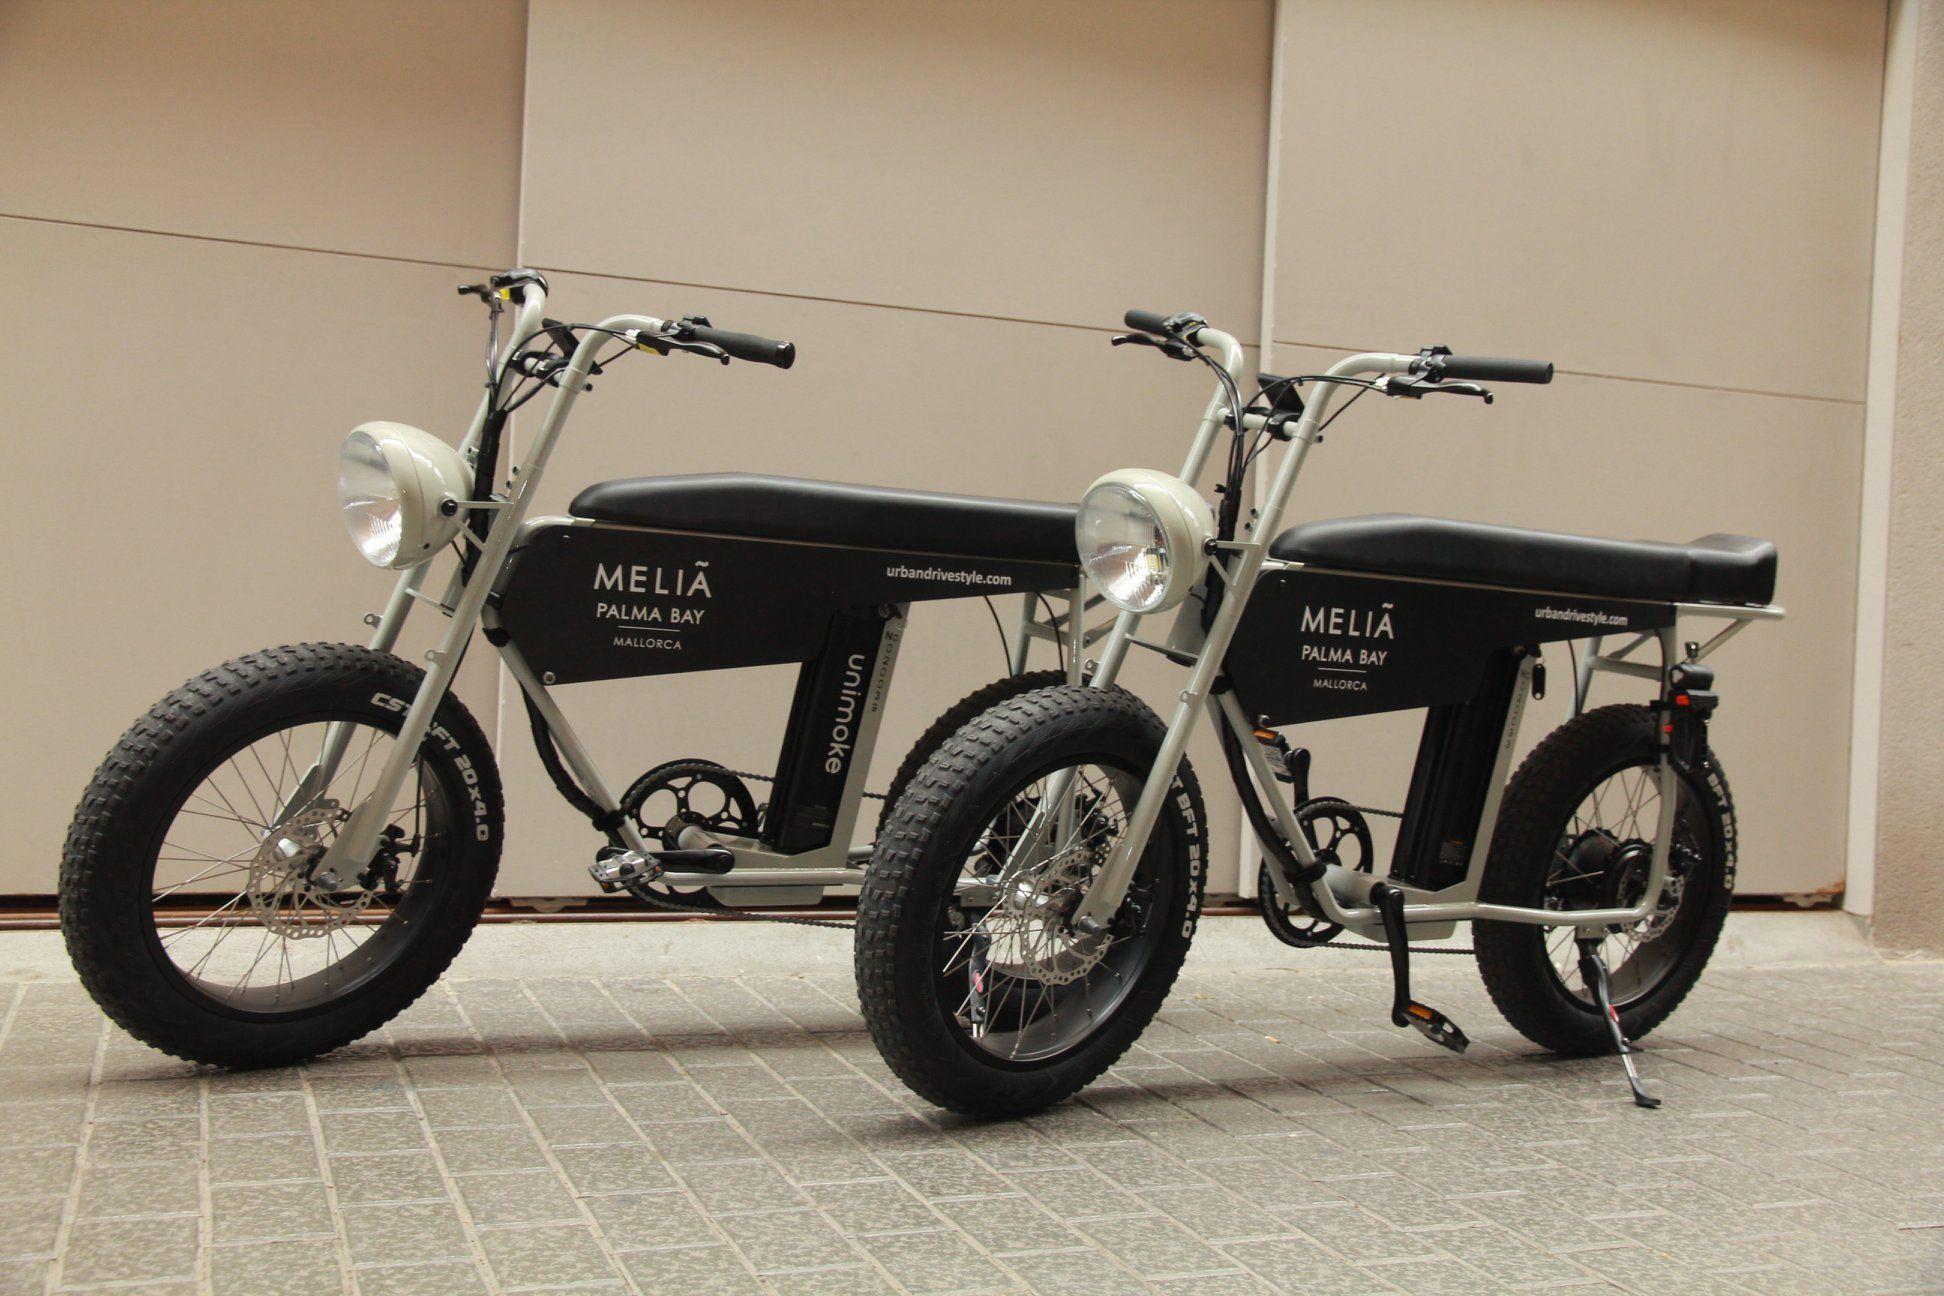 Unimoke The Perfect Electric Bike For Bike Rental And E Bike Sharing Electric Bike Electric Moped Moped